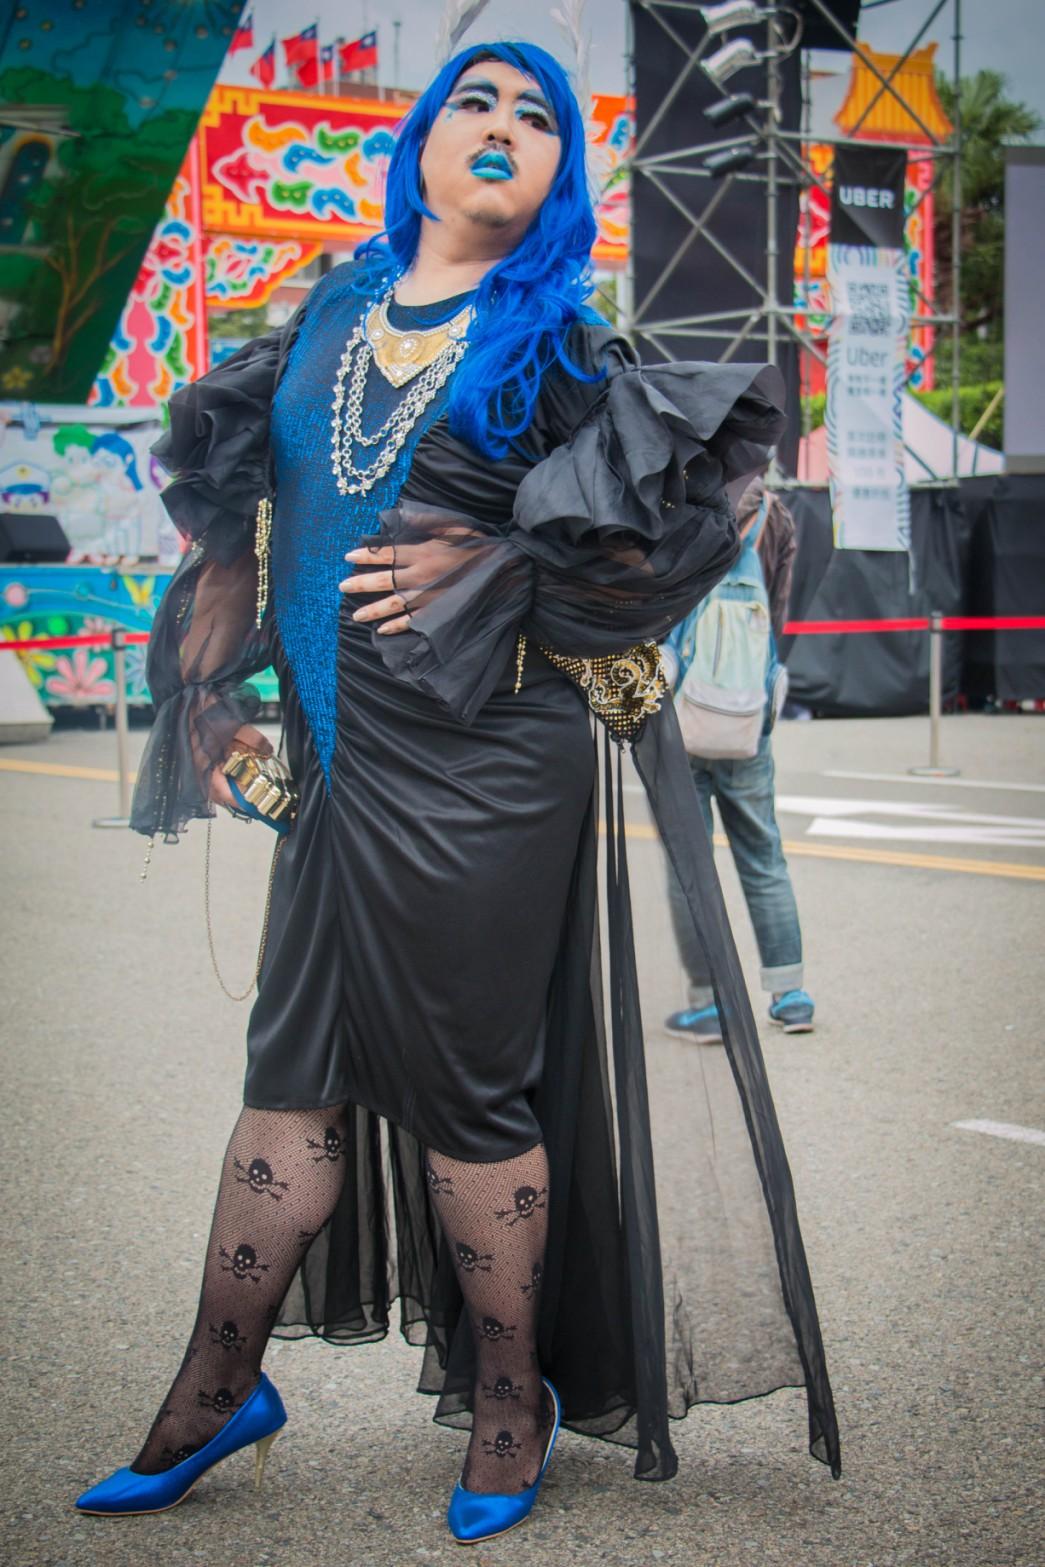 Davi Wei said that she loves dark and devil style.Photo/Hsieh, Pei-yu(謝珮瑜)